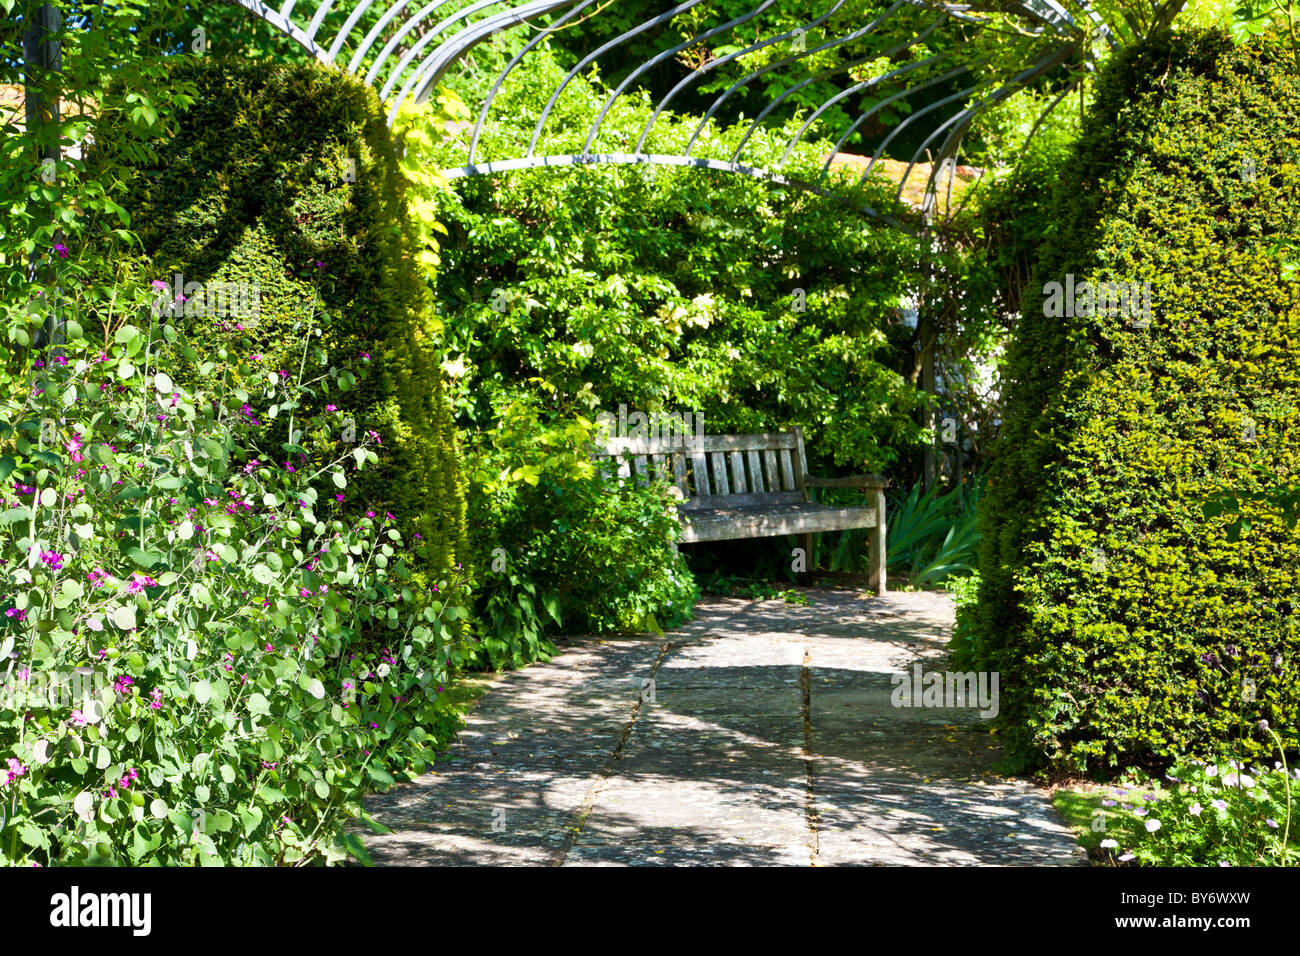 Potsdam park sanssouci blick durch die pergola unterhalbu flickr